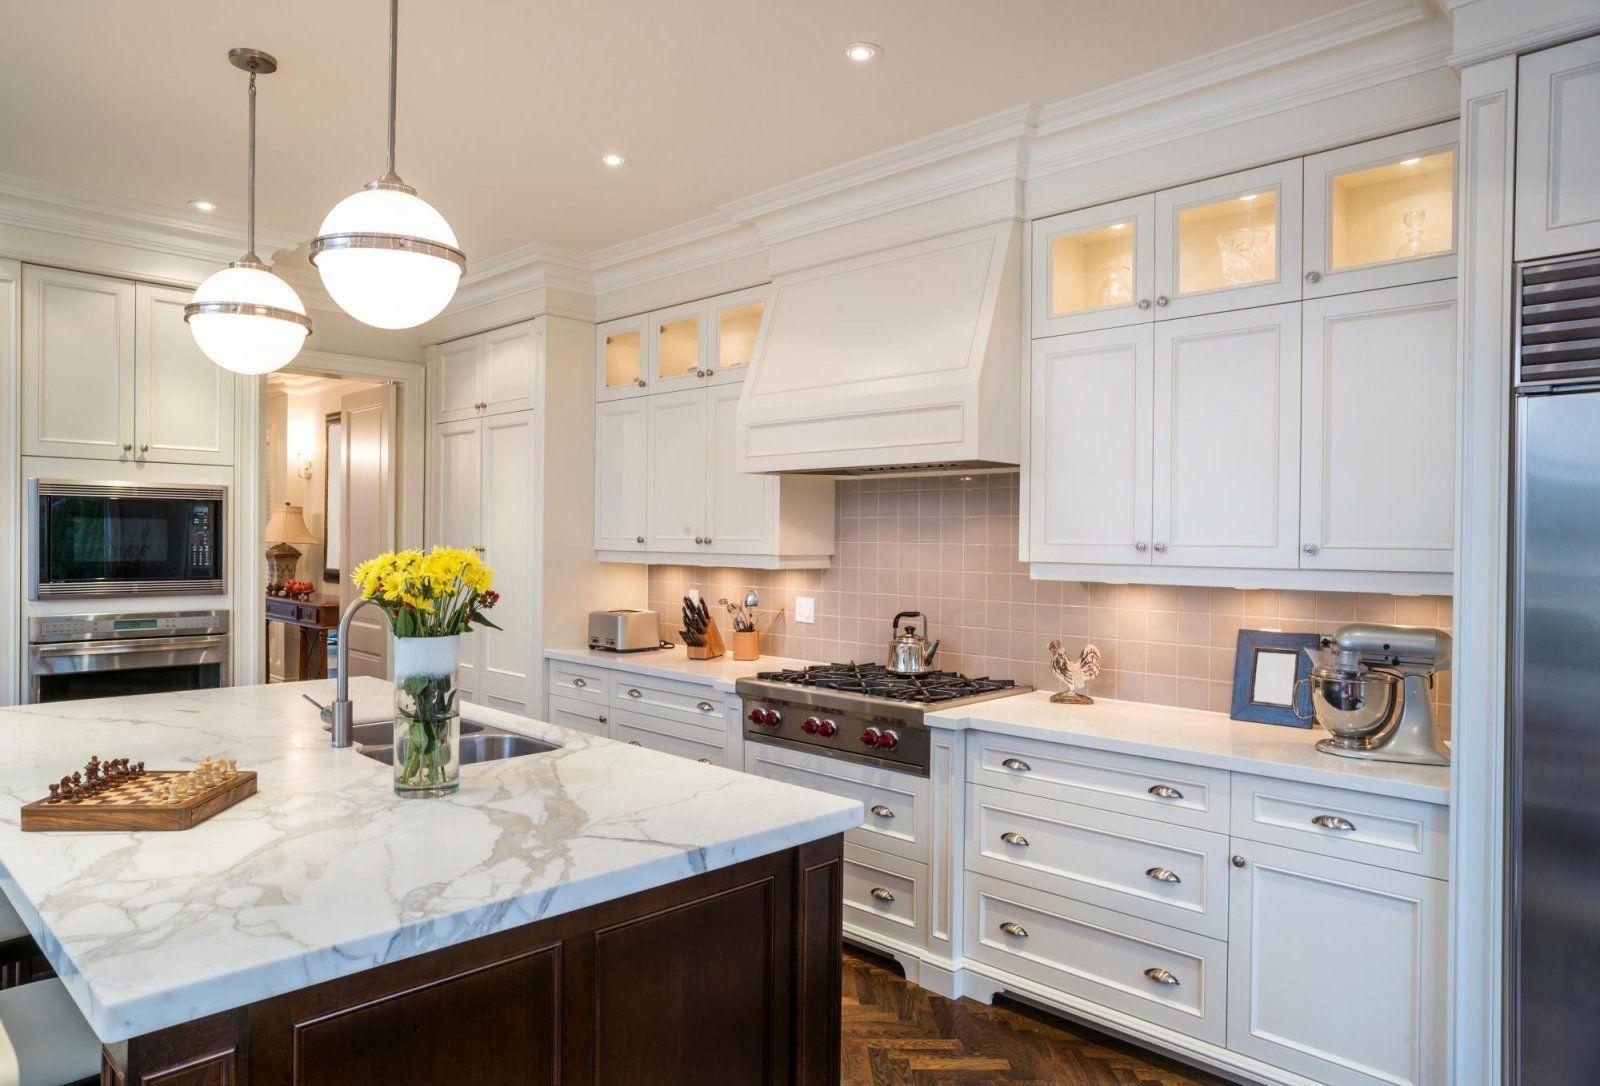 espresso chicago rta kitchen cabinets with white marble countertop ...